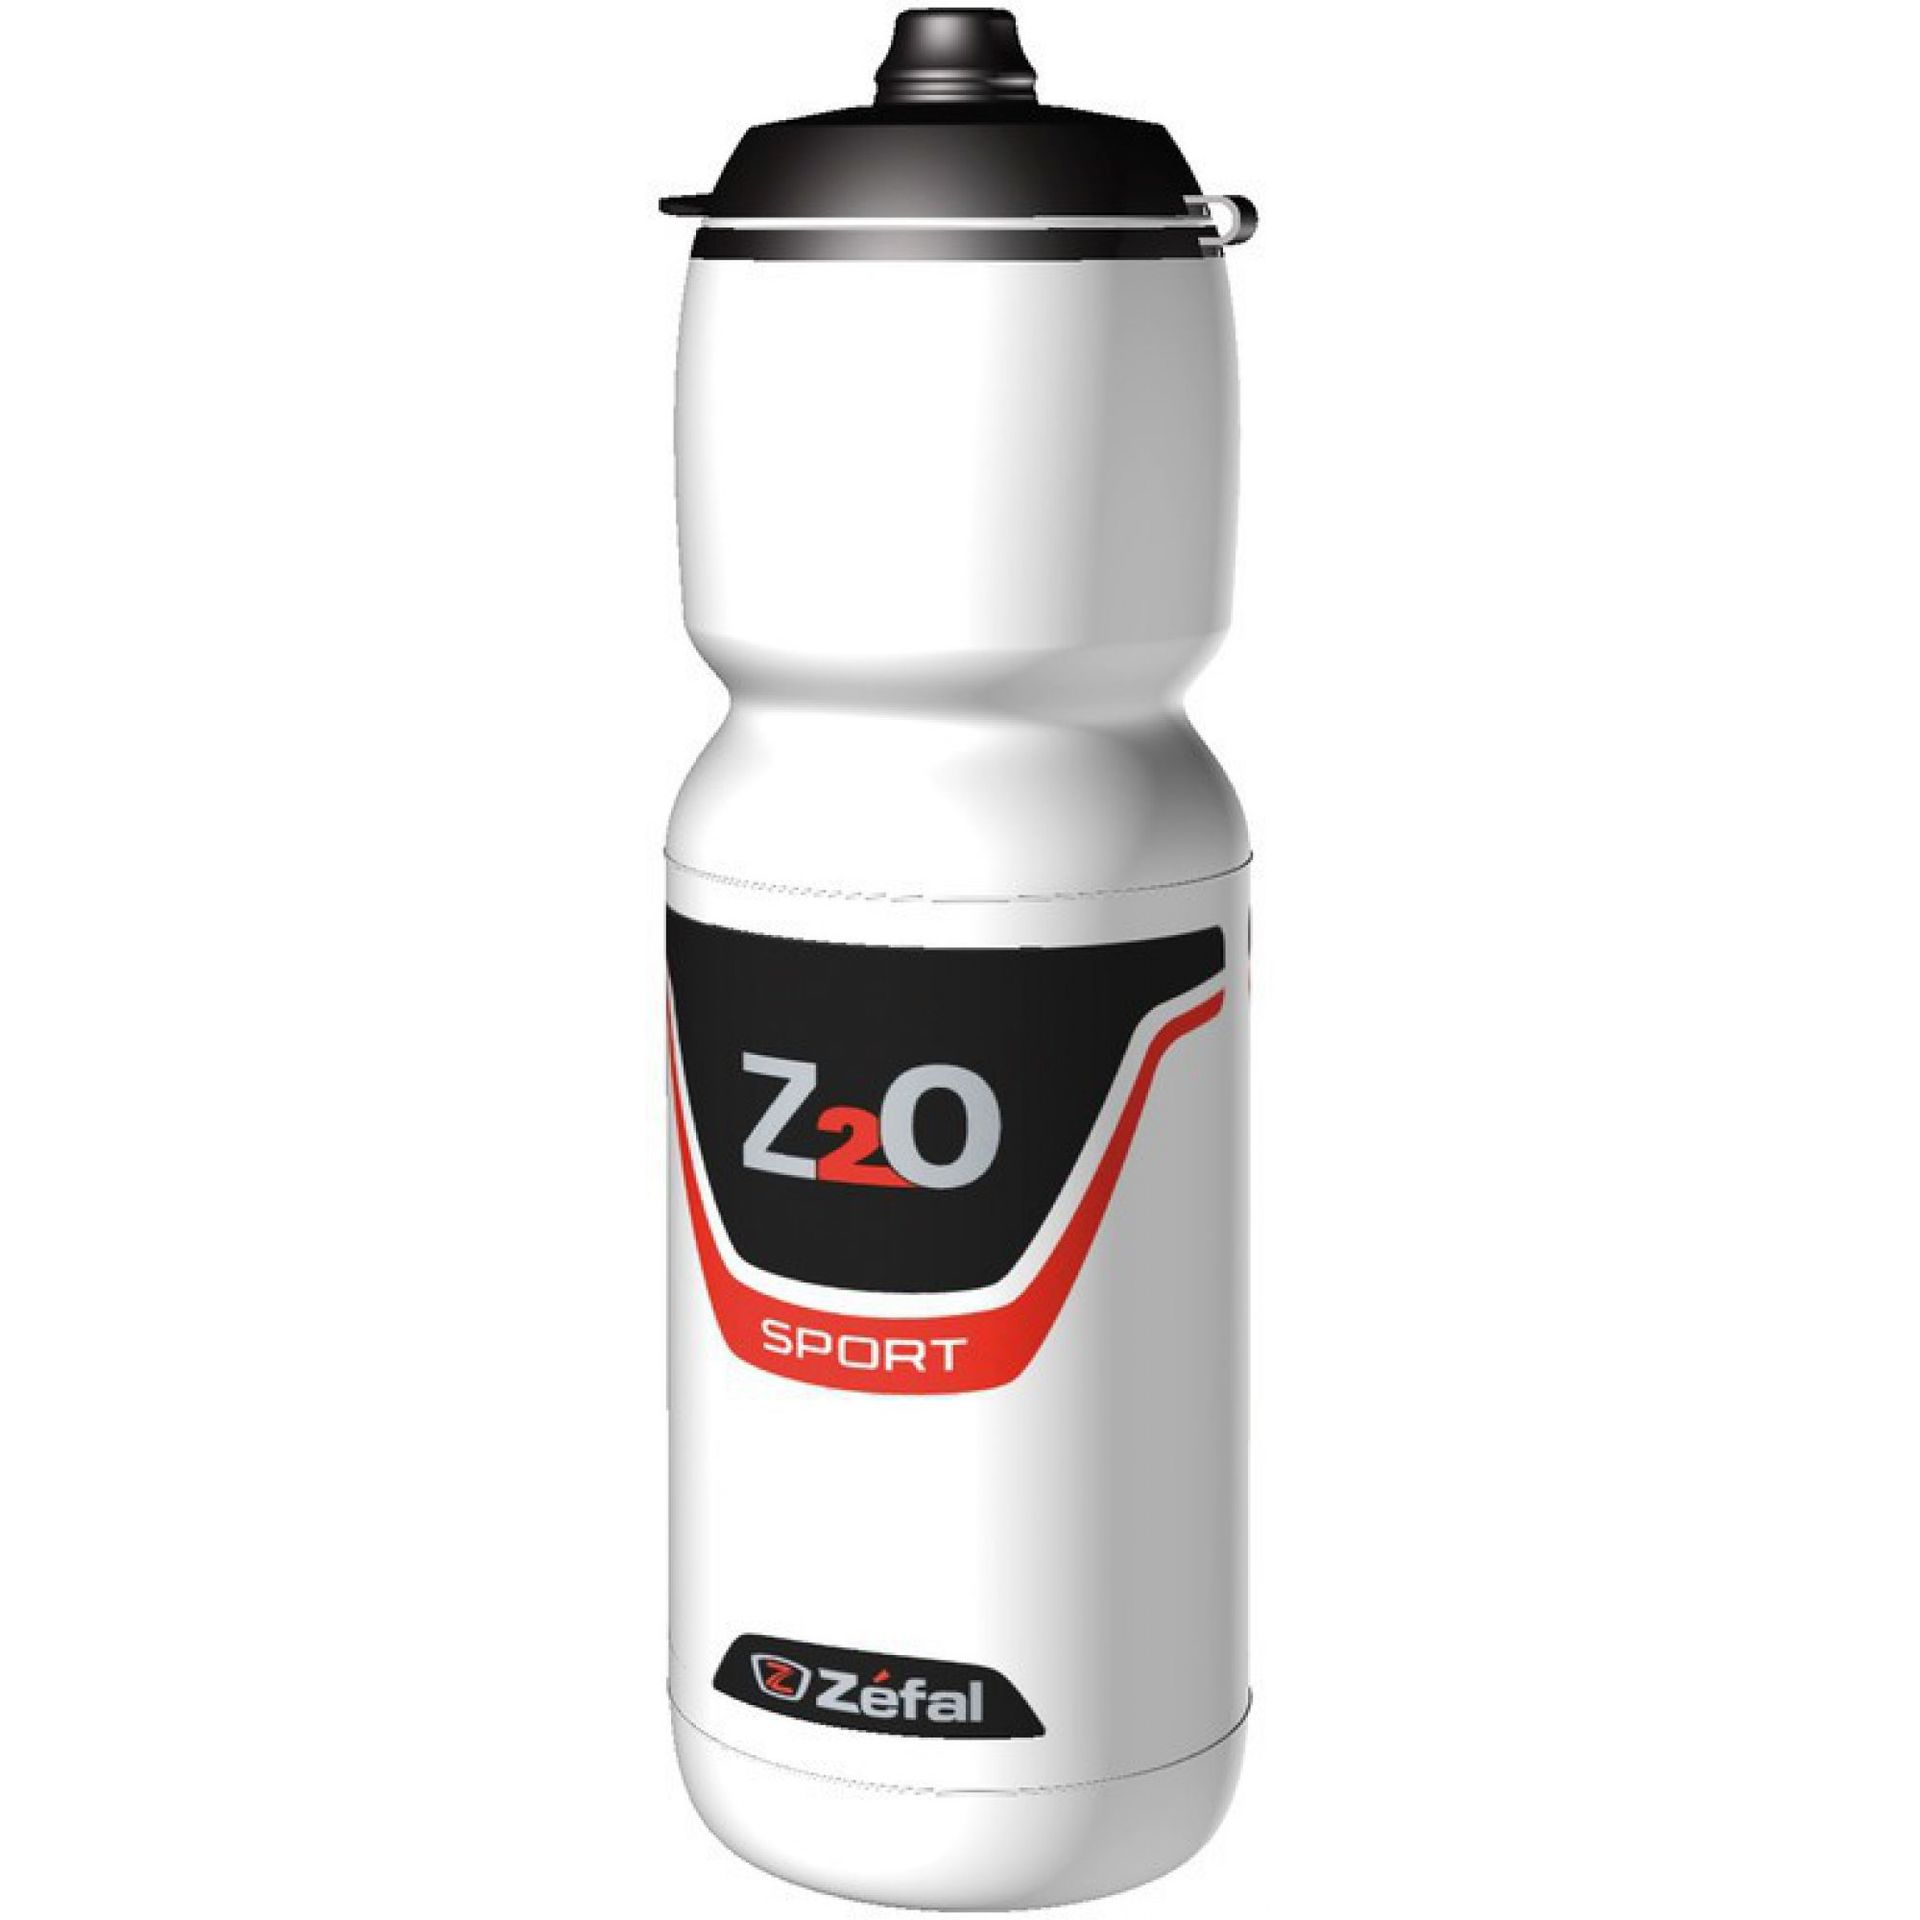 BIDON ROWEROWY ZEFAL Z2O SPORT